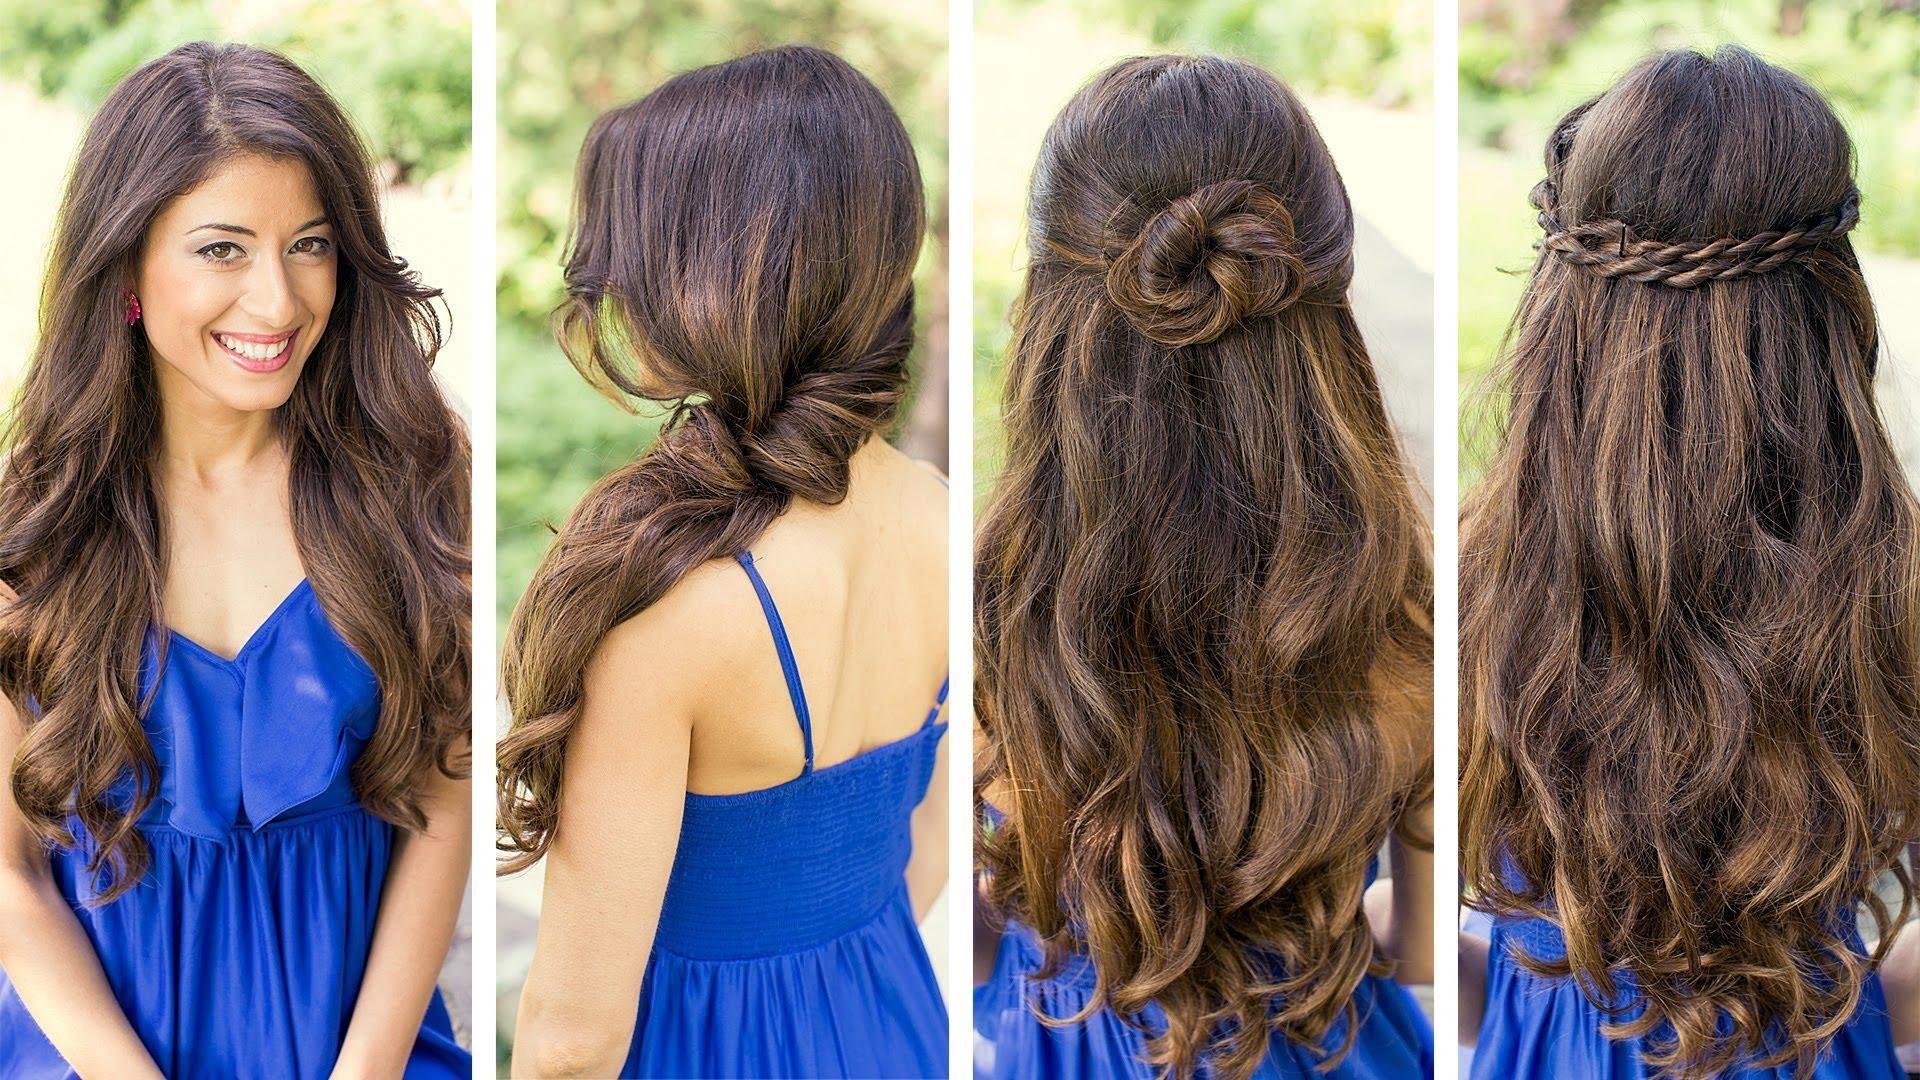 peinados sencillos trenzas belleza cabello largo fiestas maquillaje diferentes peinados peinados lindos coleccin